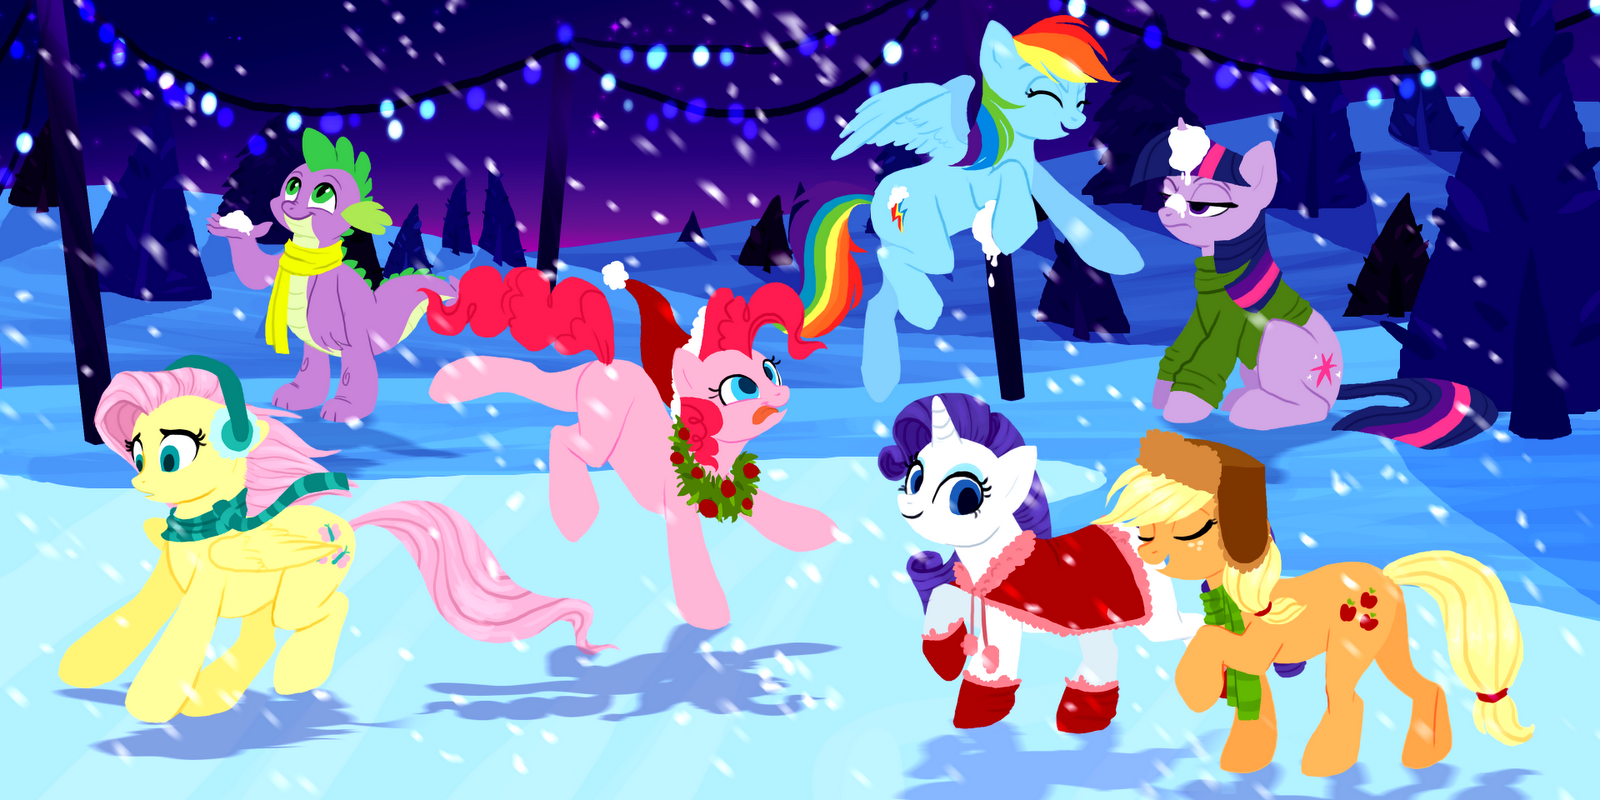 http://4.bp.blogspot.com/-FTLXdzxplGw/Tufty3qVLuI/AAAAAAAAAD0/4bwSXWEGk2M/s1600/97595+-+applejack+artist-bluebirdrae288+fluttershy+outfit+pinkie_pie+rainbow_dash+rarity+snow+snowball+spike+twilight_sparkle+winter.png